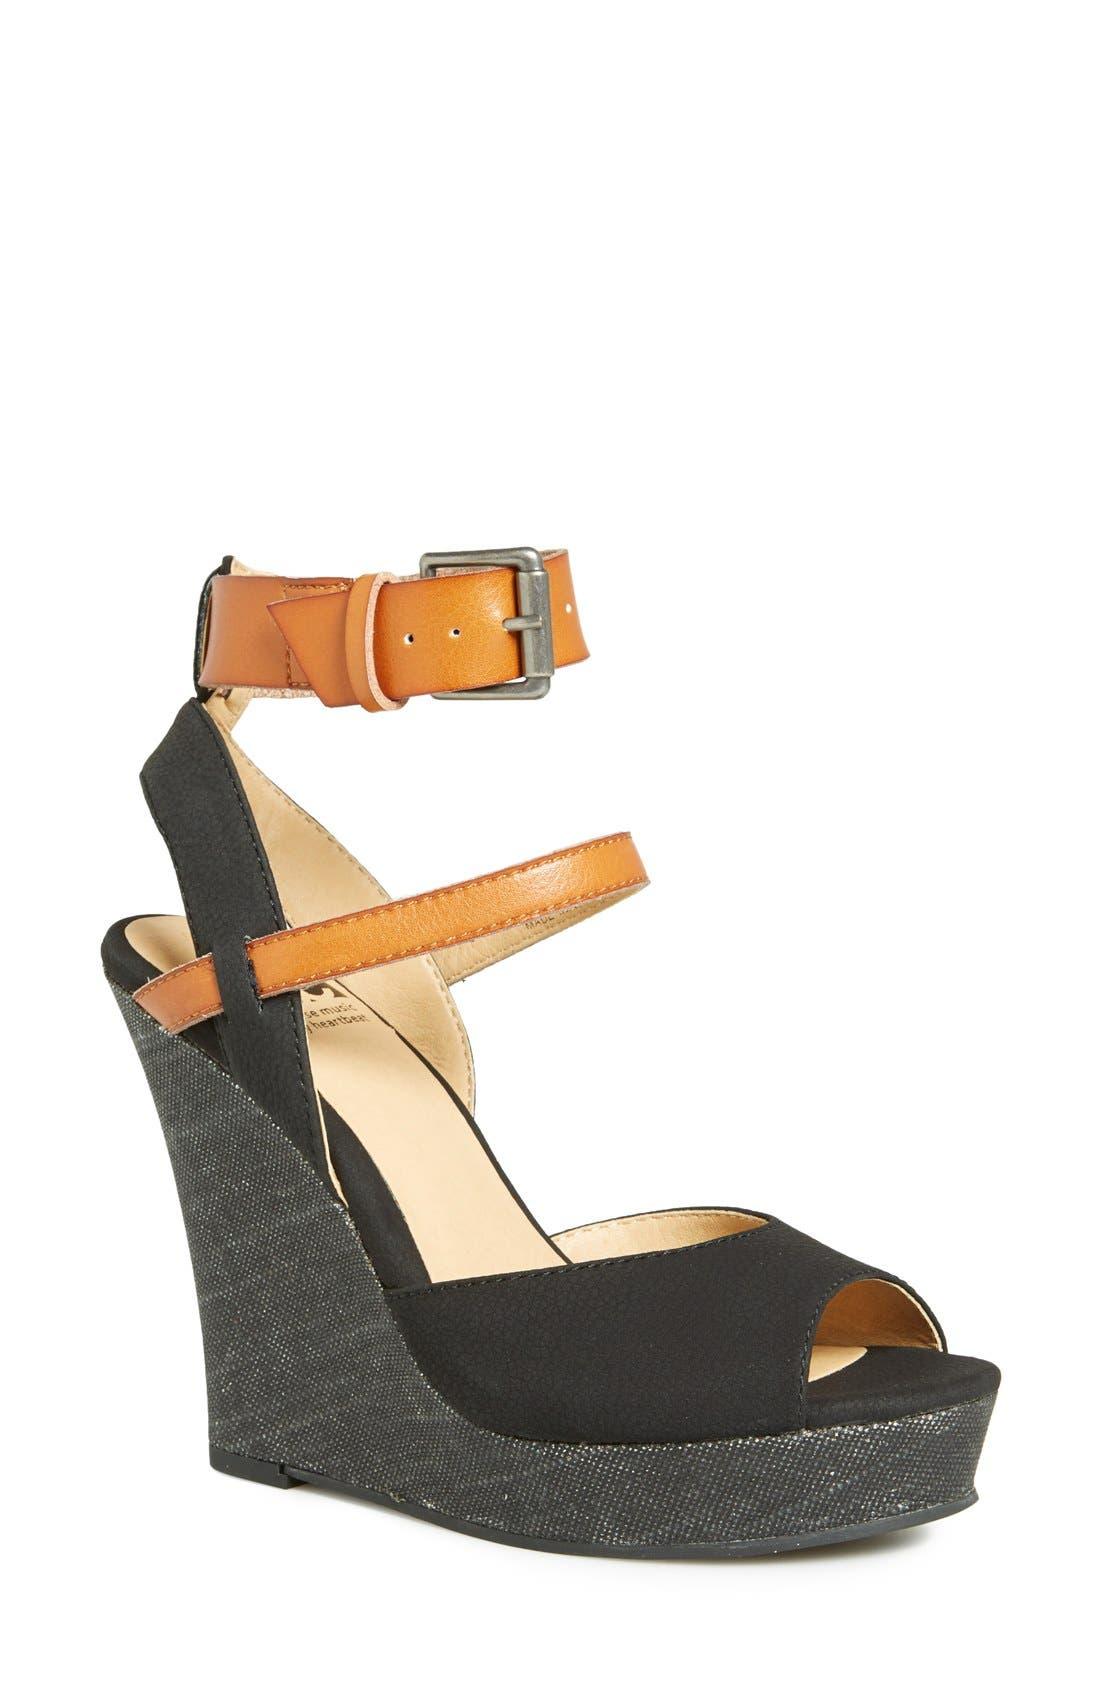 Alternate Image 1 Selected - BC Footwear 'Move It' Wedge Sandal (Women)